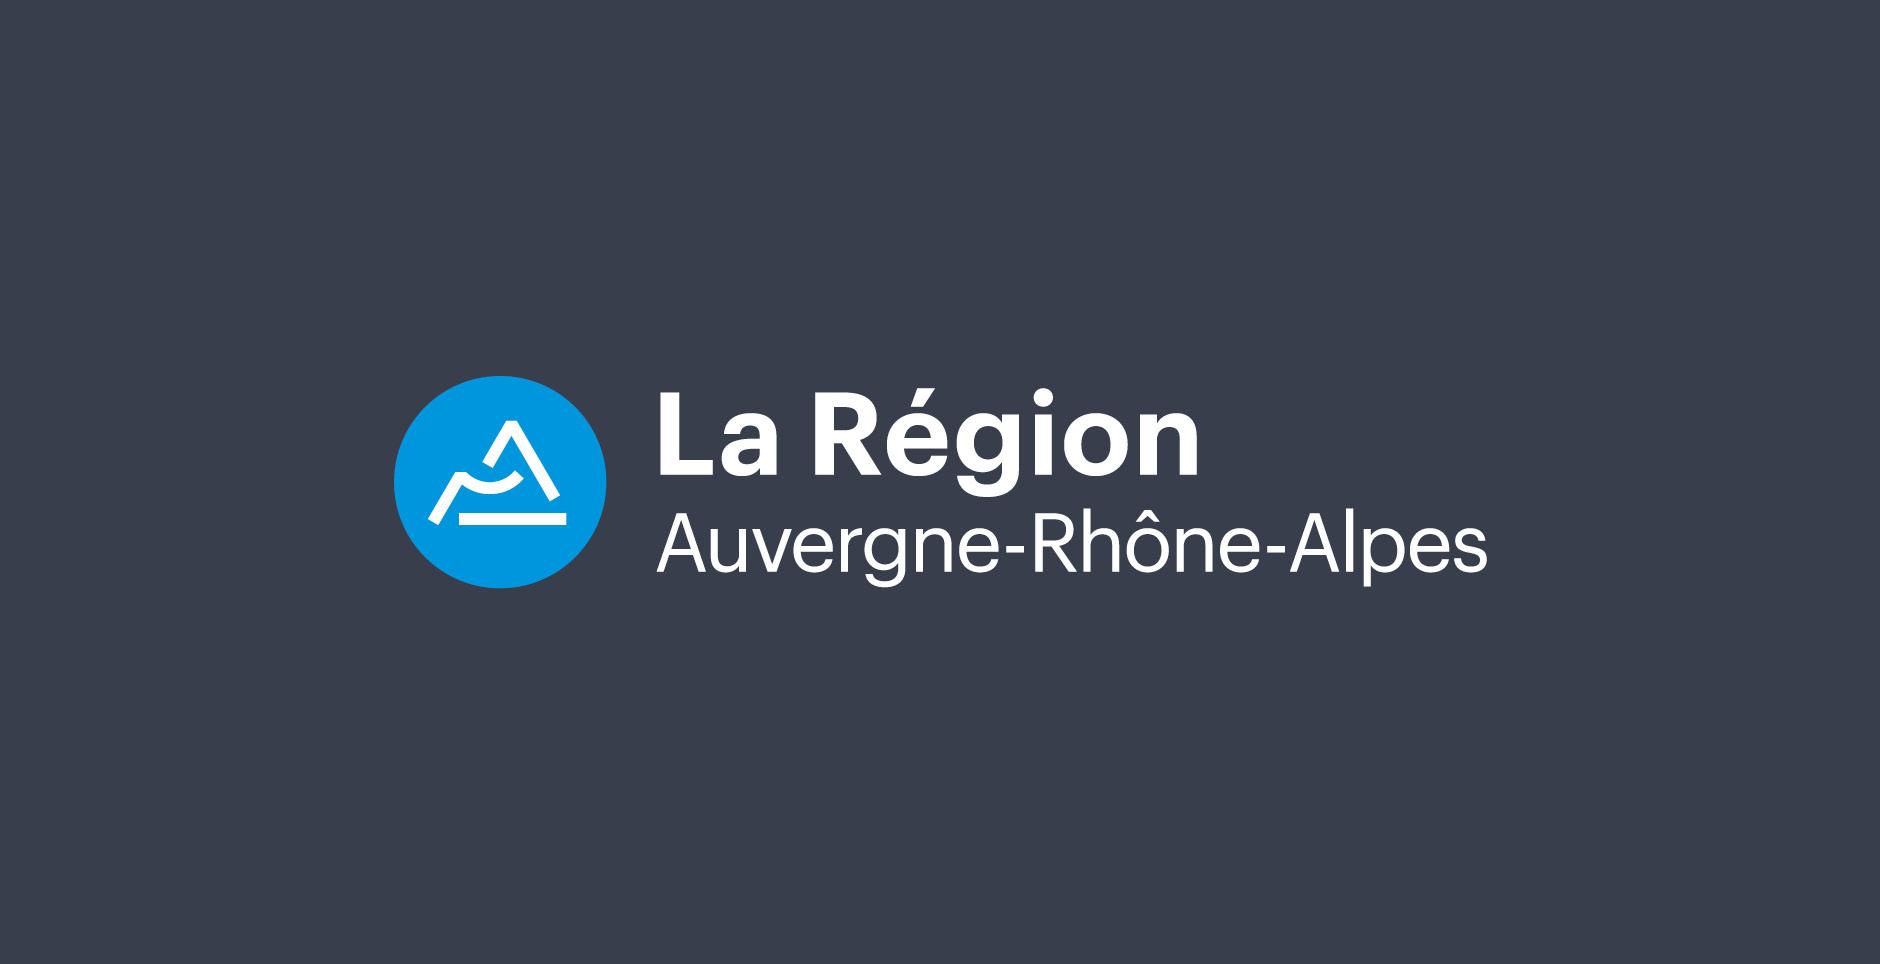 region-auvergne-rhone-alpes-branding2